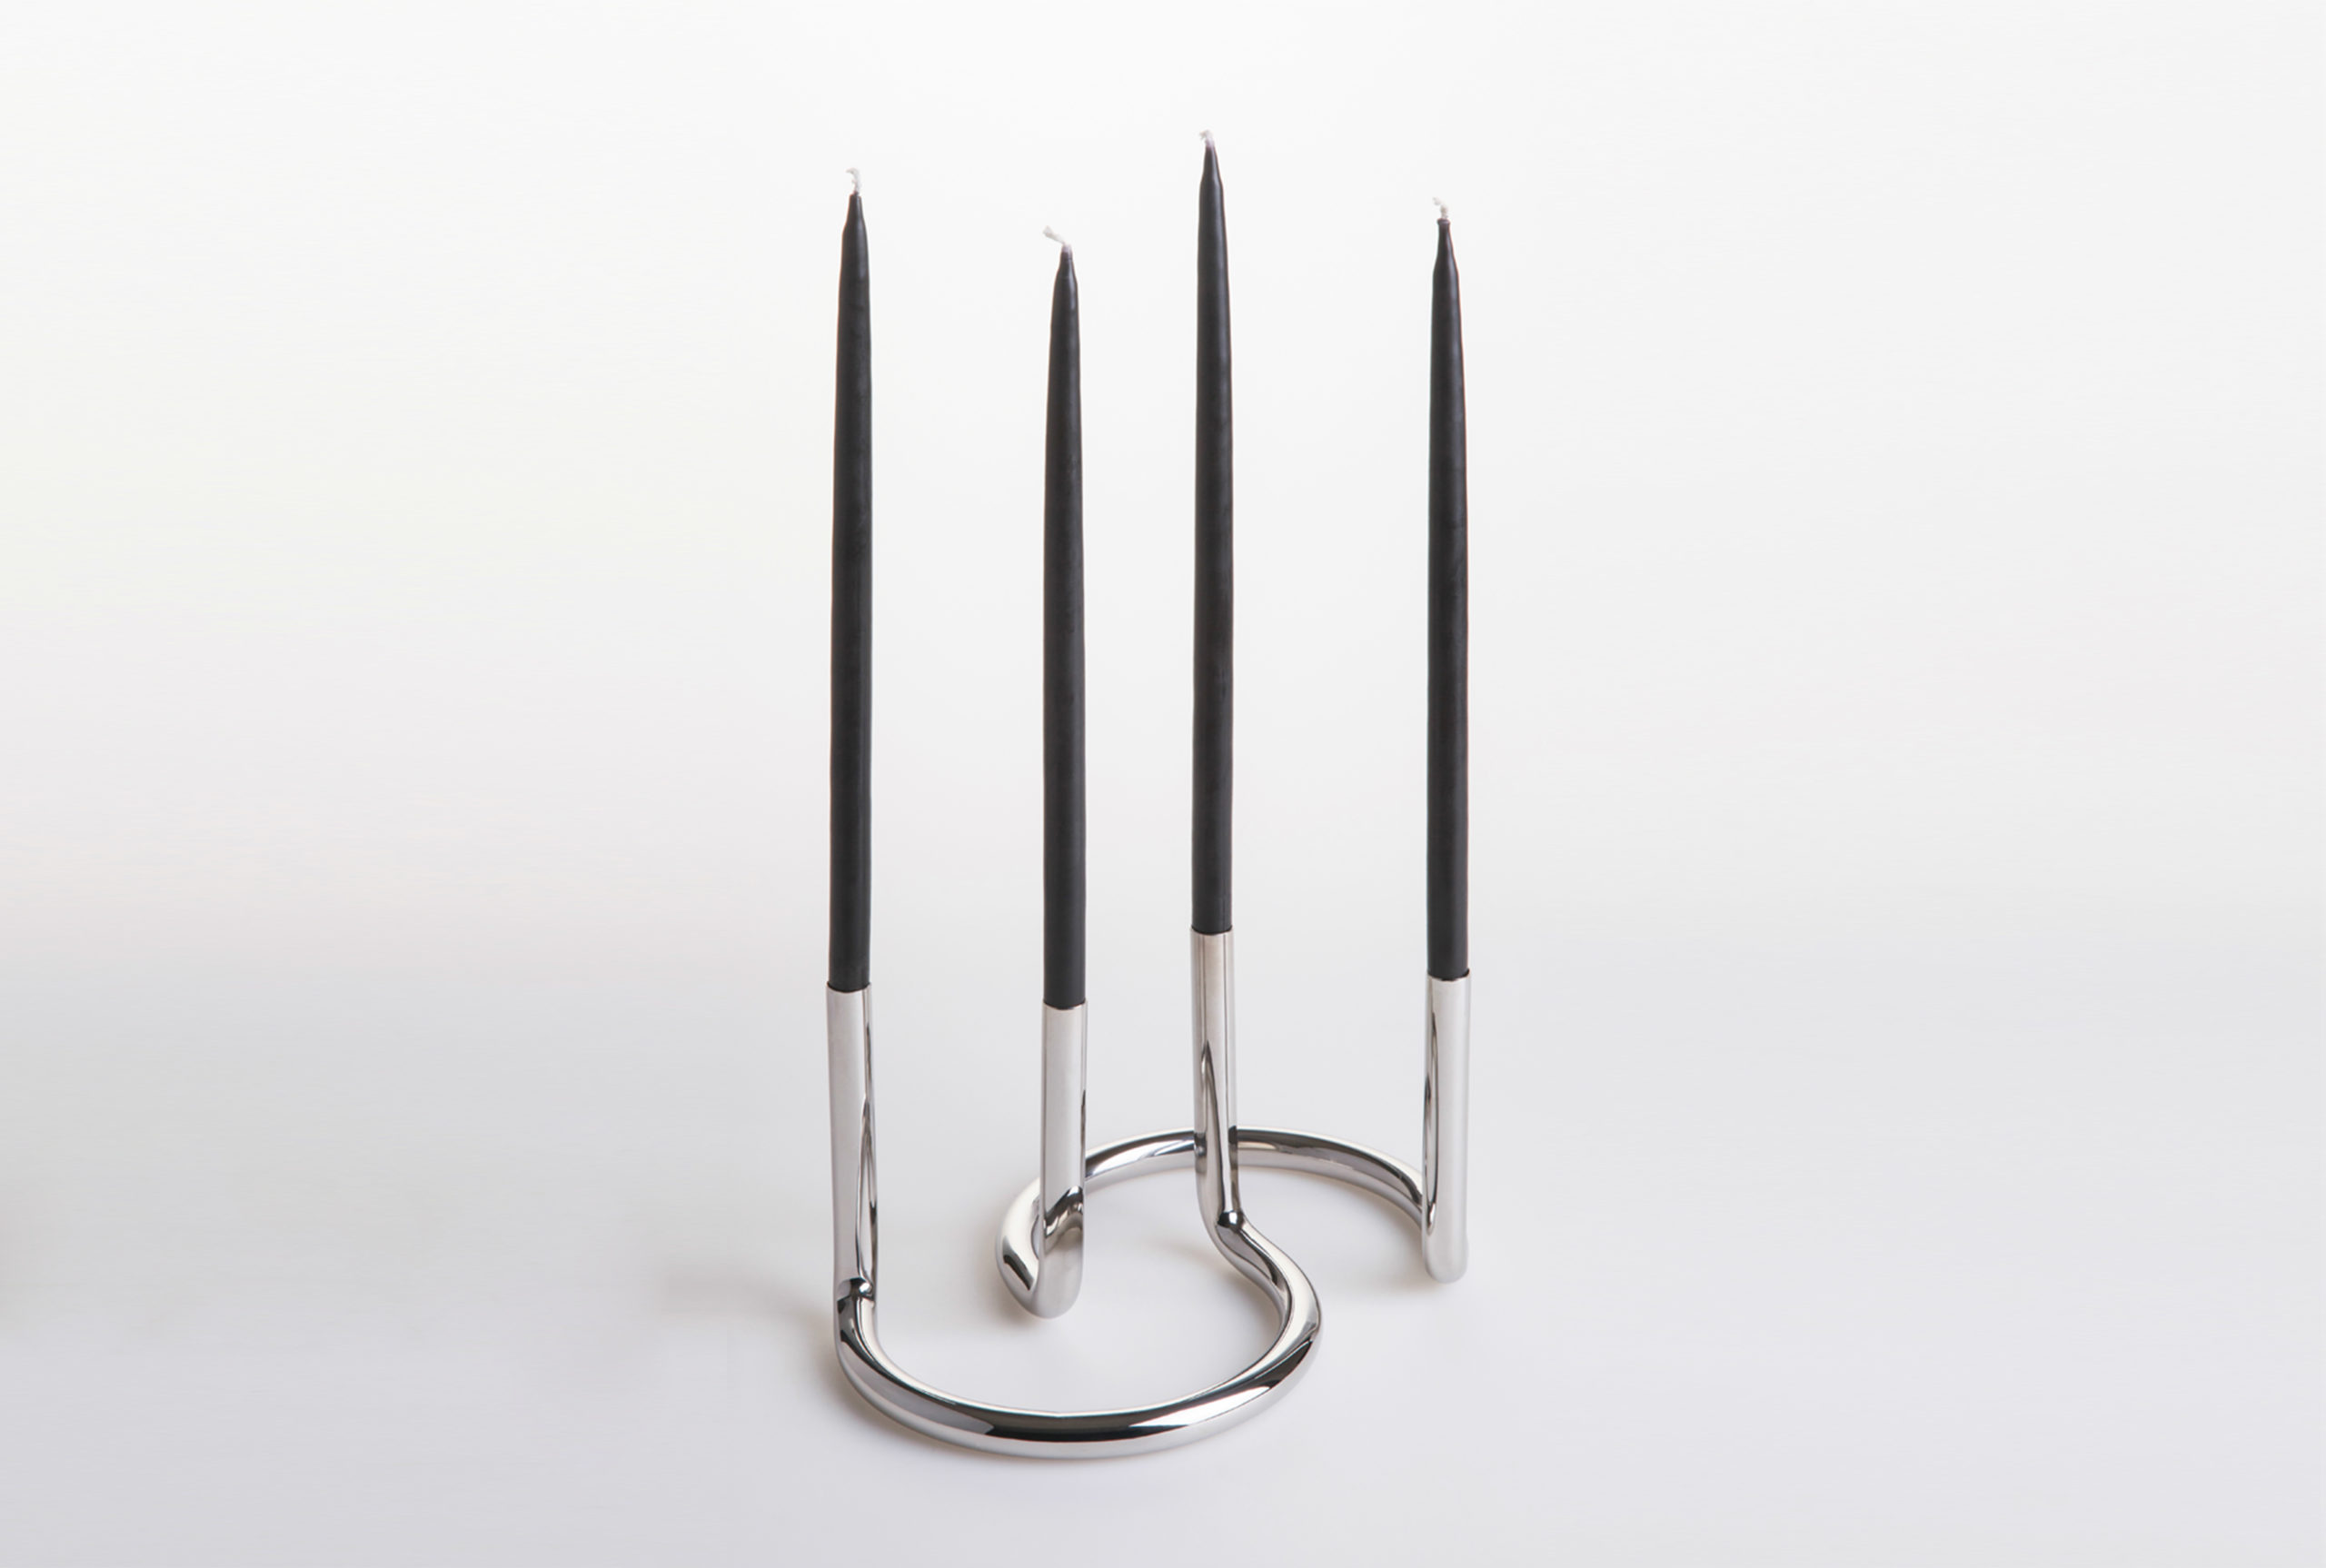 Architectmade-Gemini-Polished-Stainless-Steel-Candleholder-Peter-Karpf-1